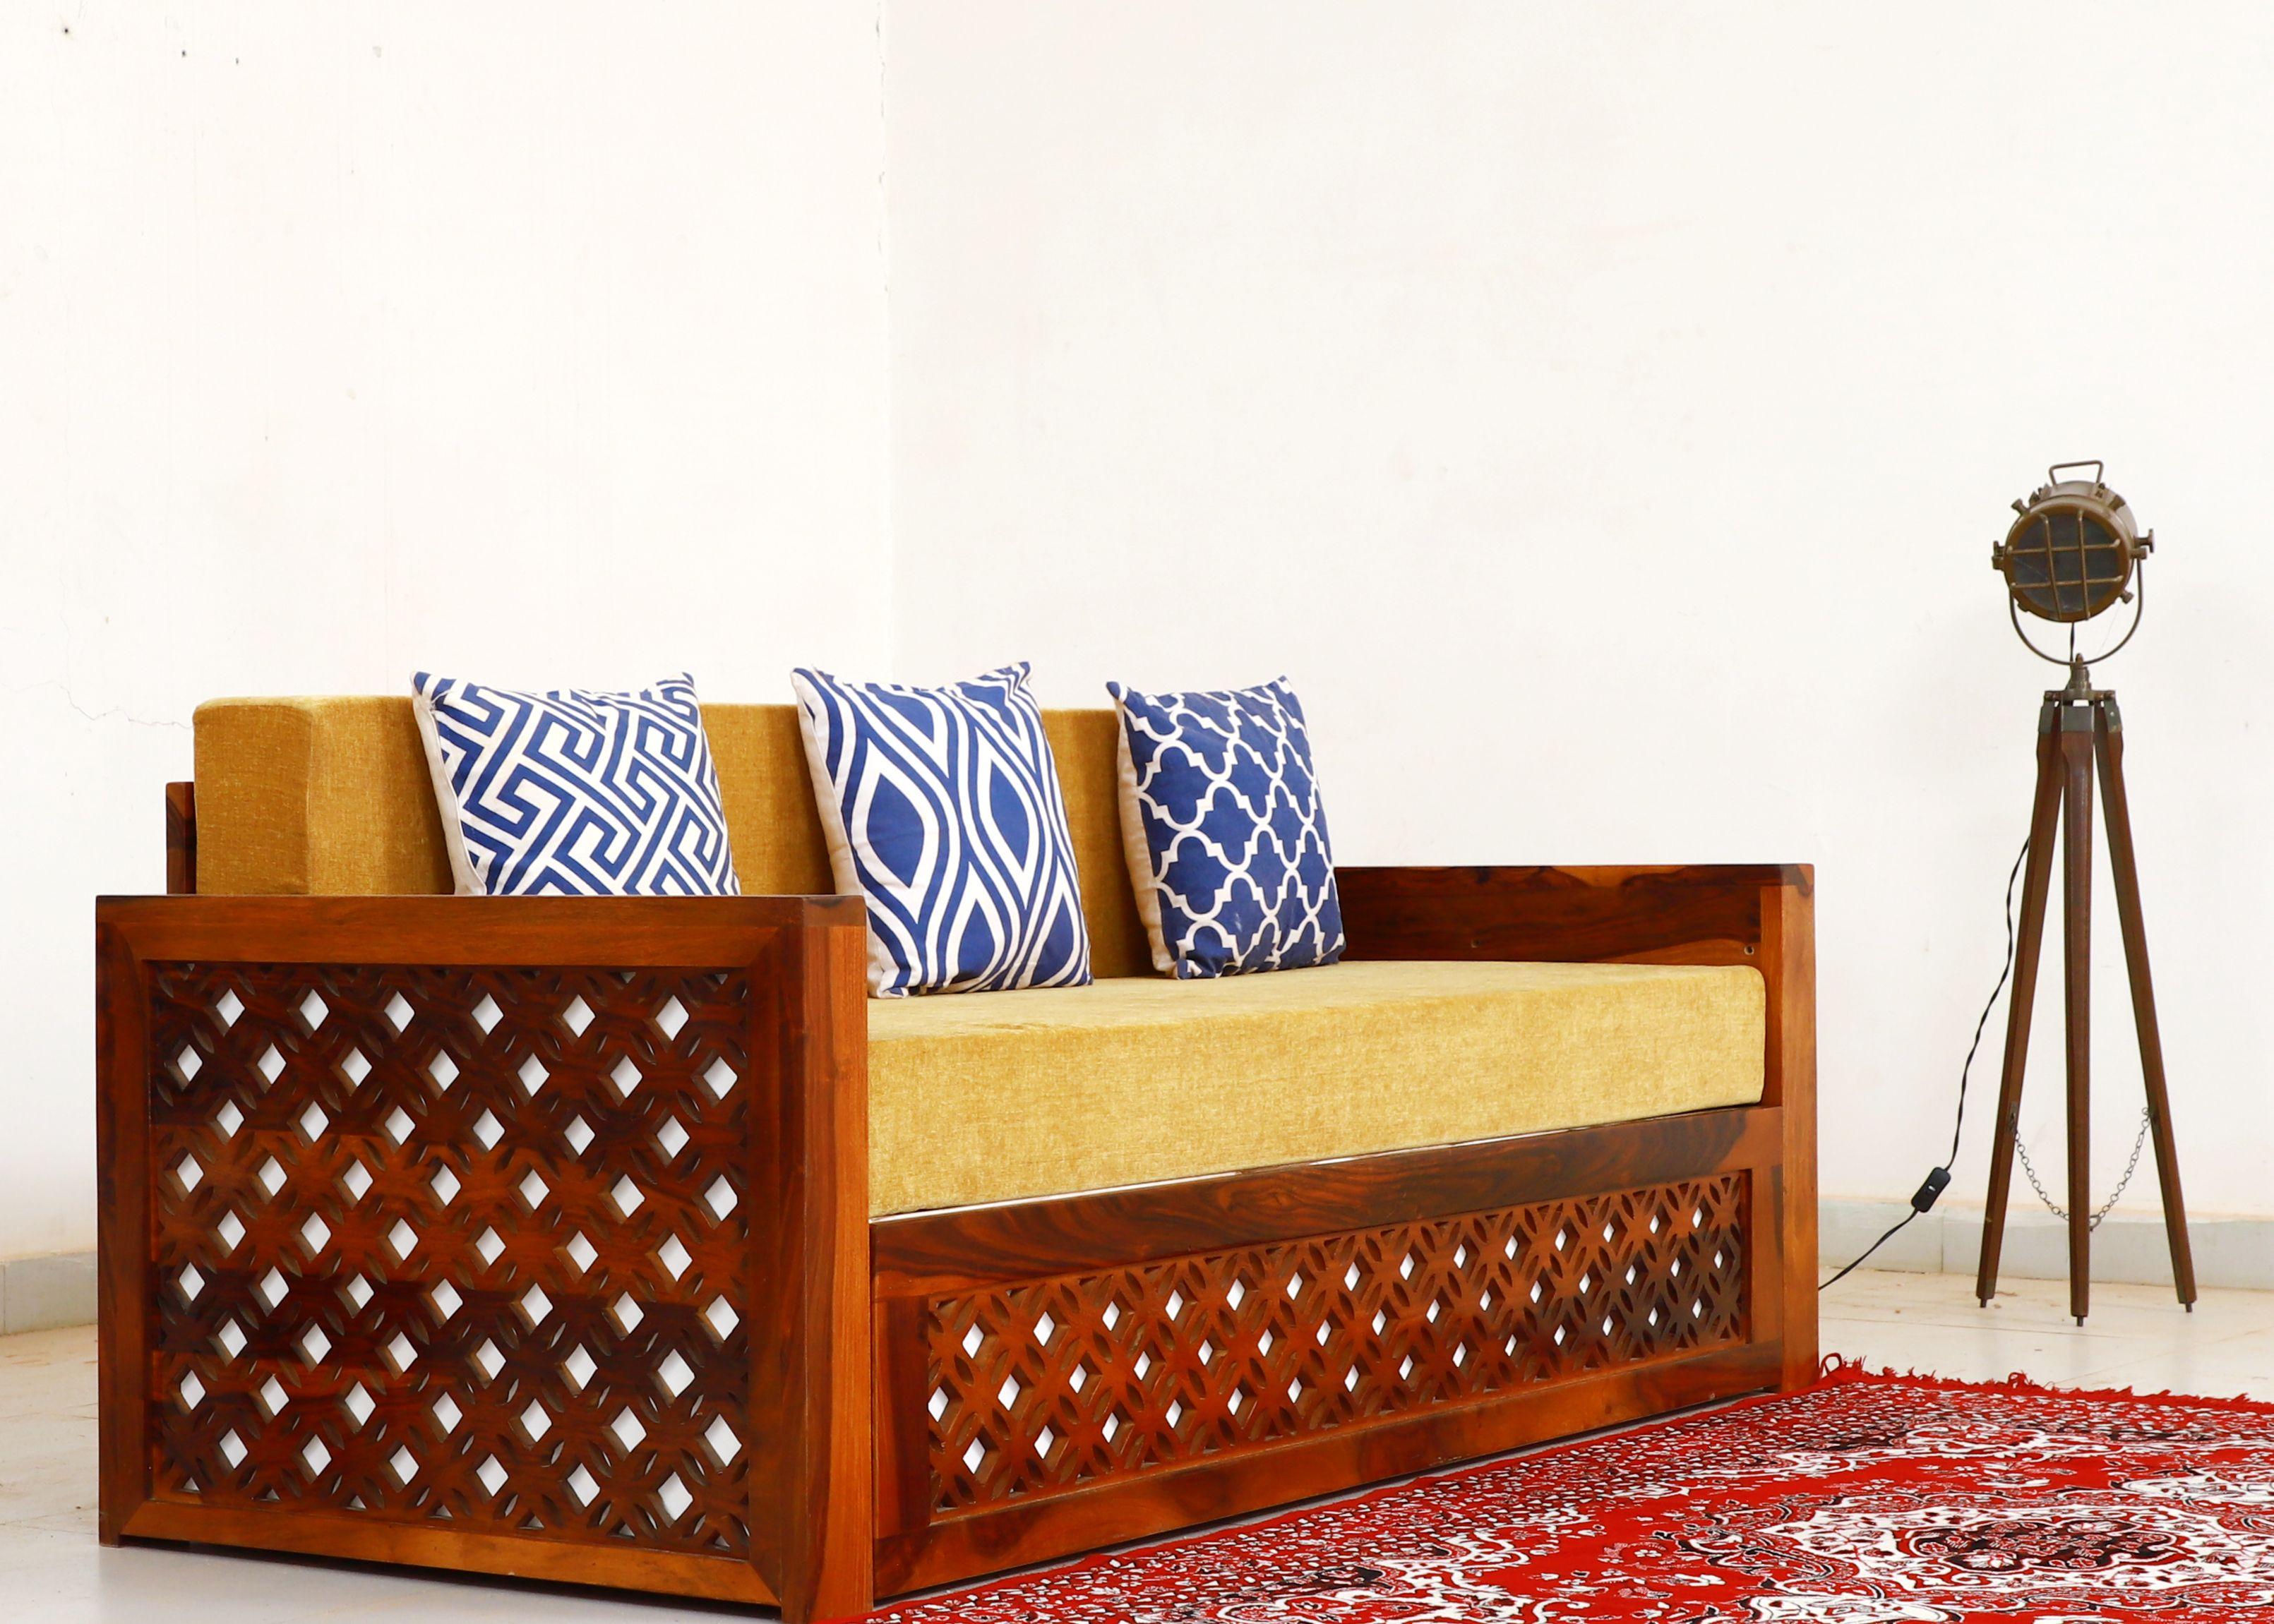 Wooden Sofa Set Buy Wooden Sofa Set Online At Best Prices Jodhpuri Furniture Get Upto 60 Off In 2020 Wooden Sofa Designs Wooden Sofa Set Wooden Sofa